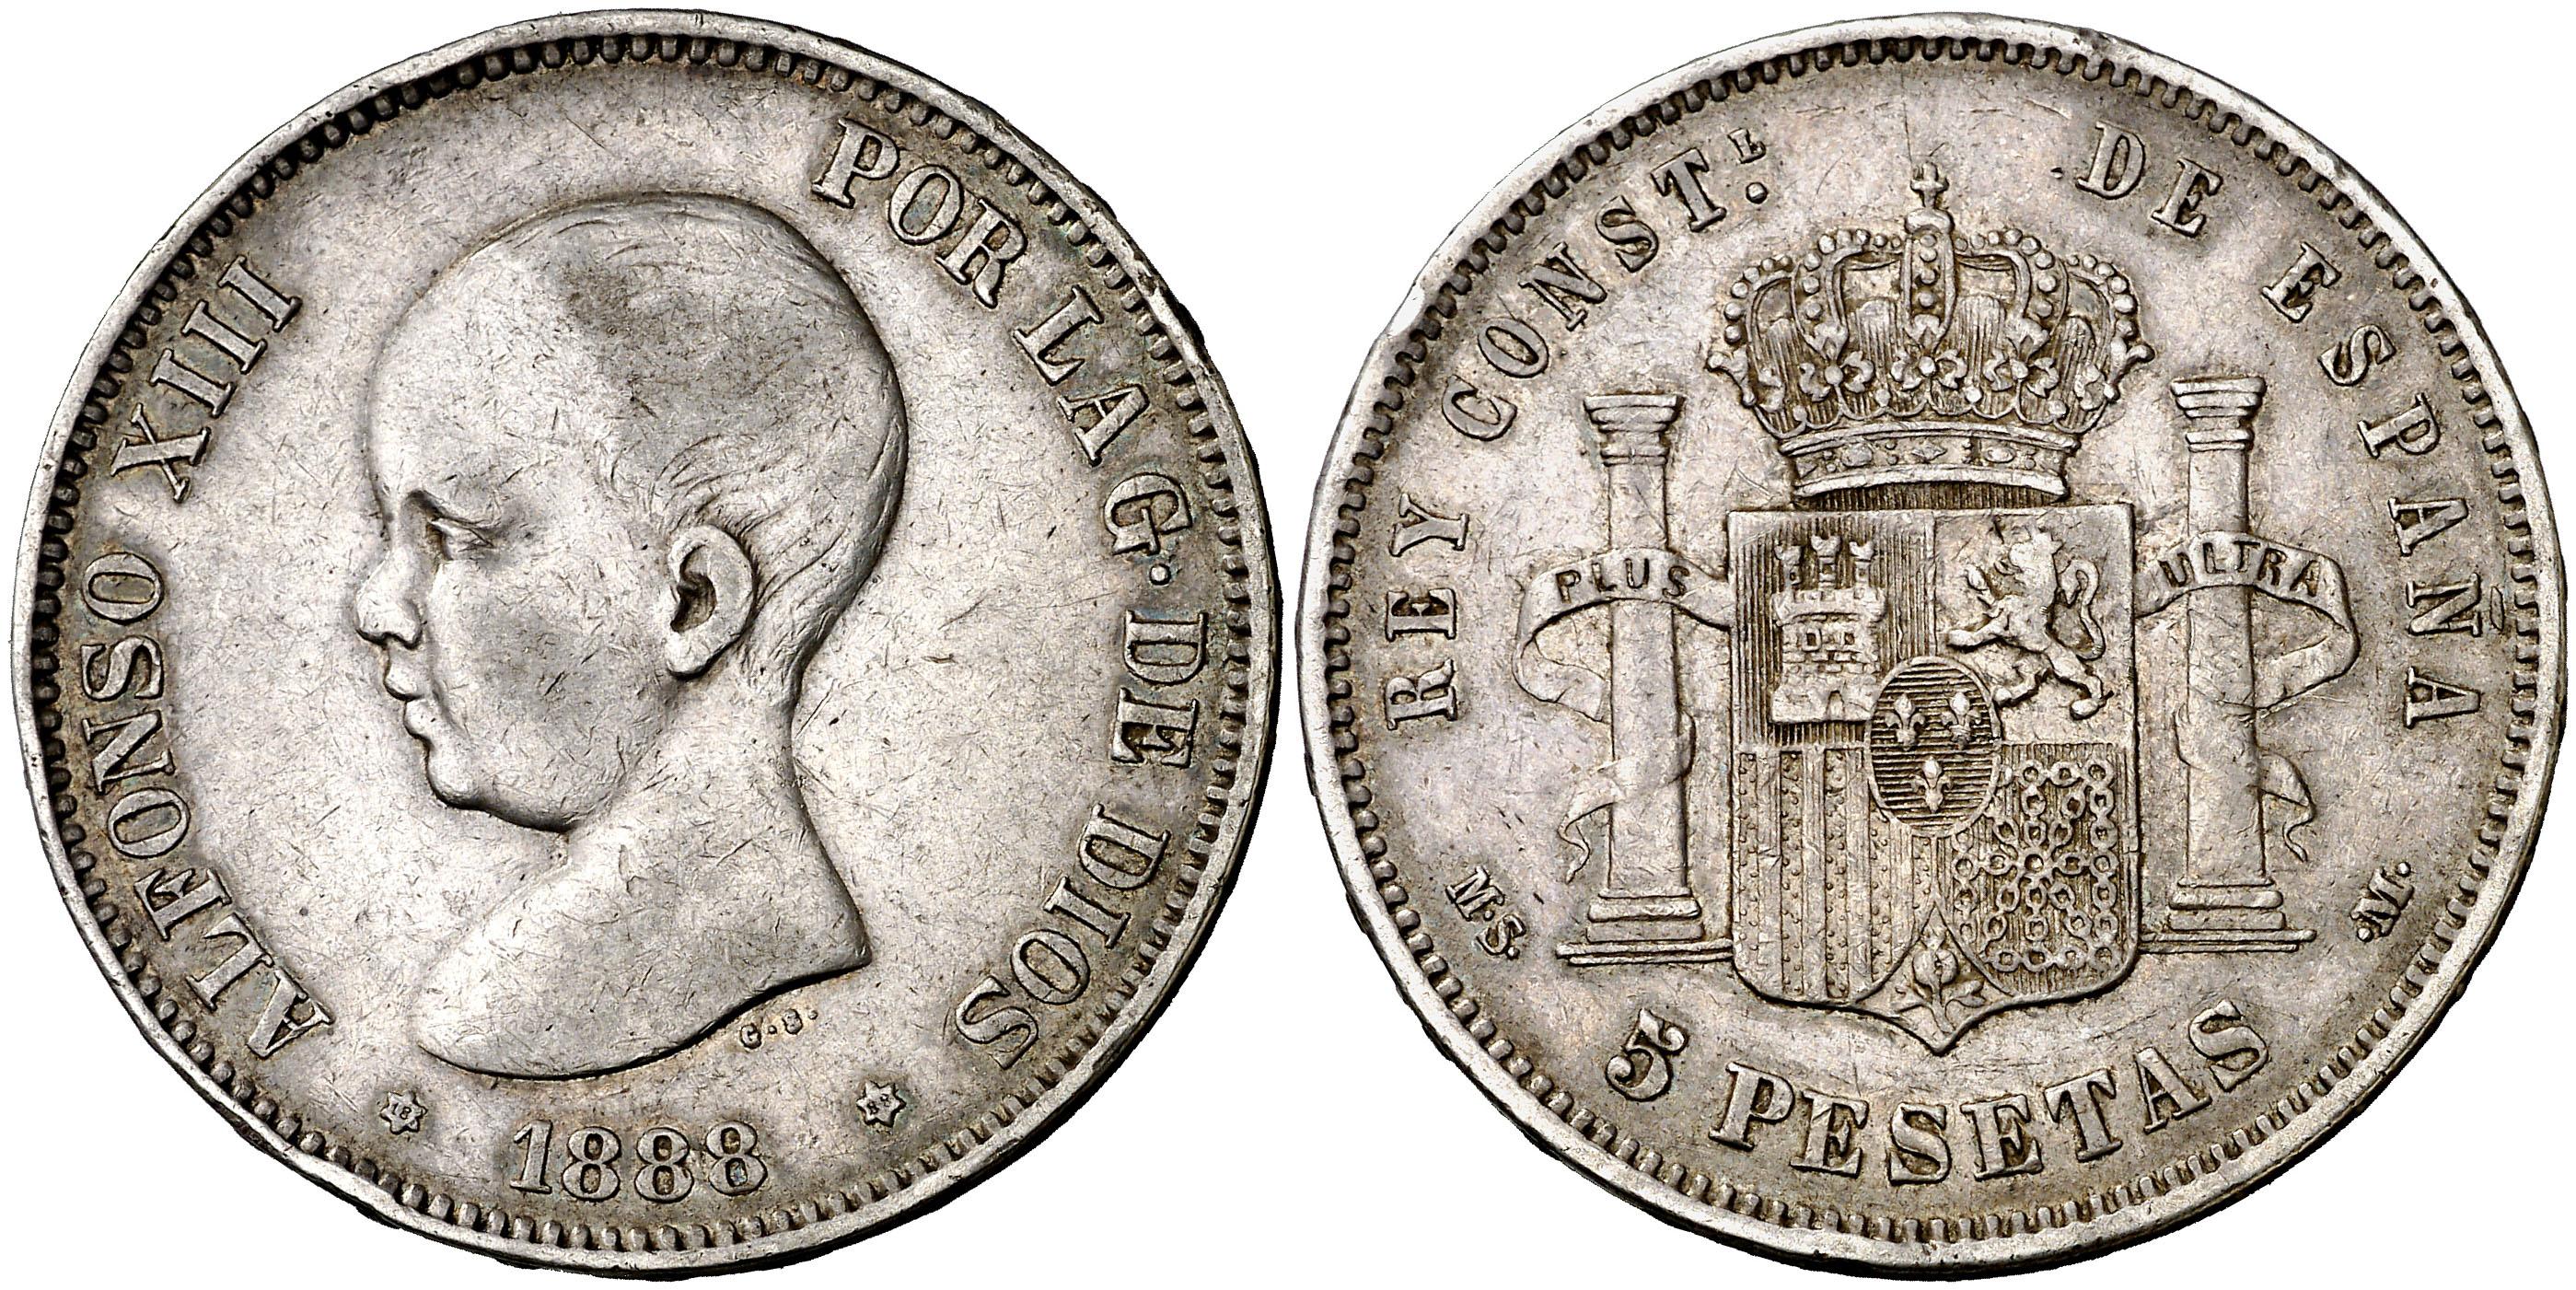 5 pesetas mbc